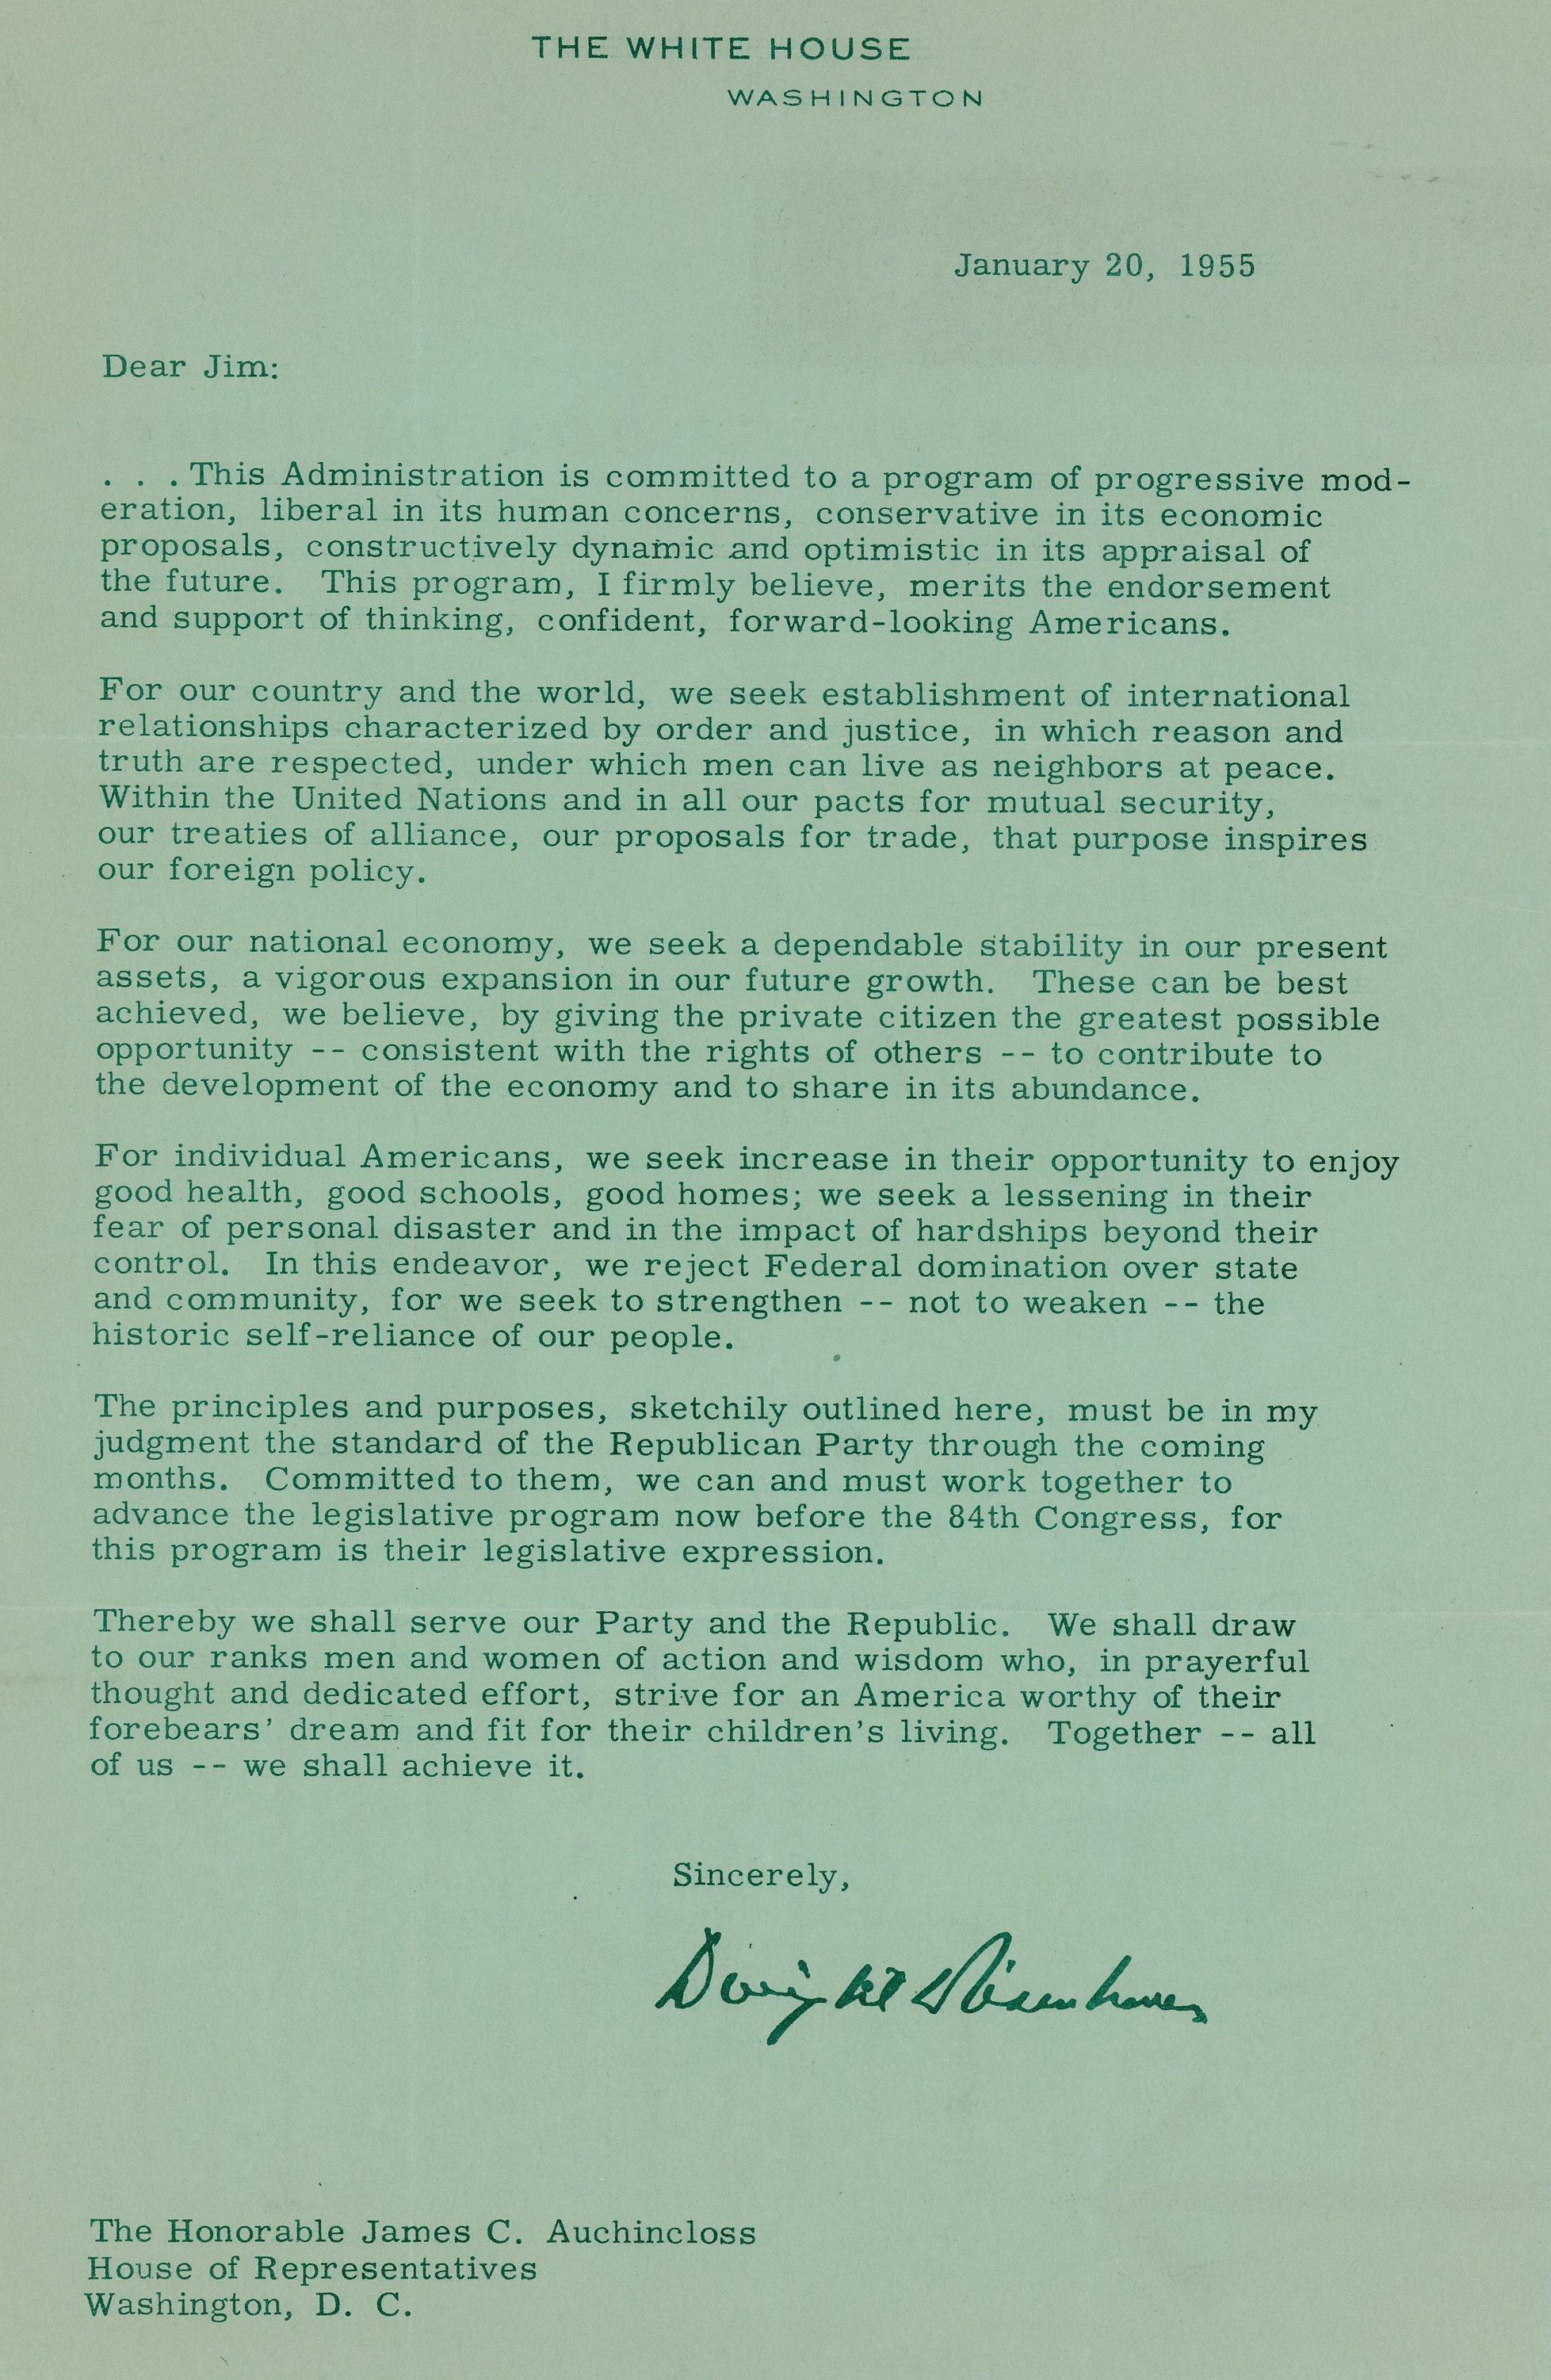 A letter to James C. Auchincloss from President Dwight D. Eisenhower